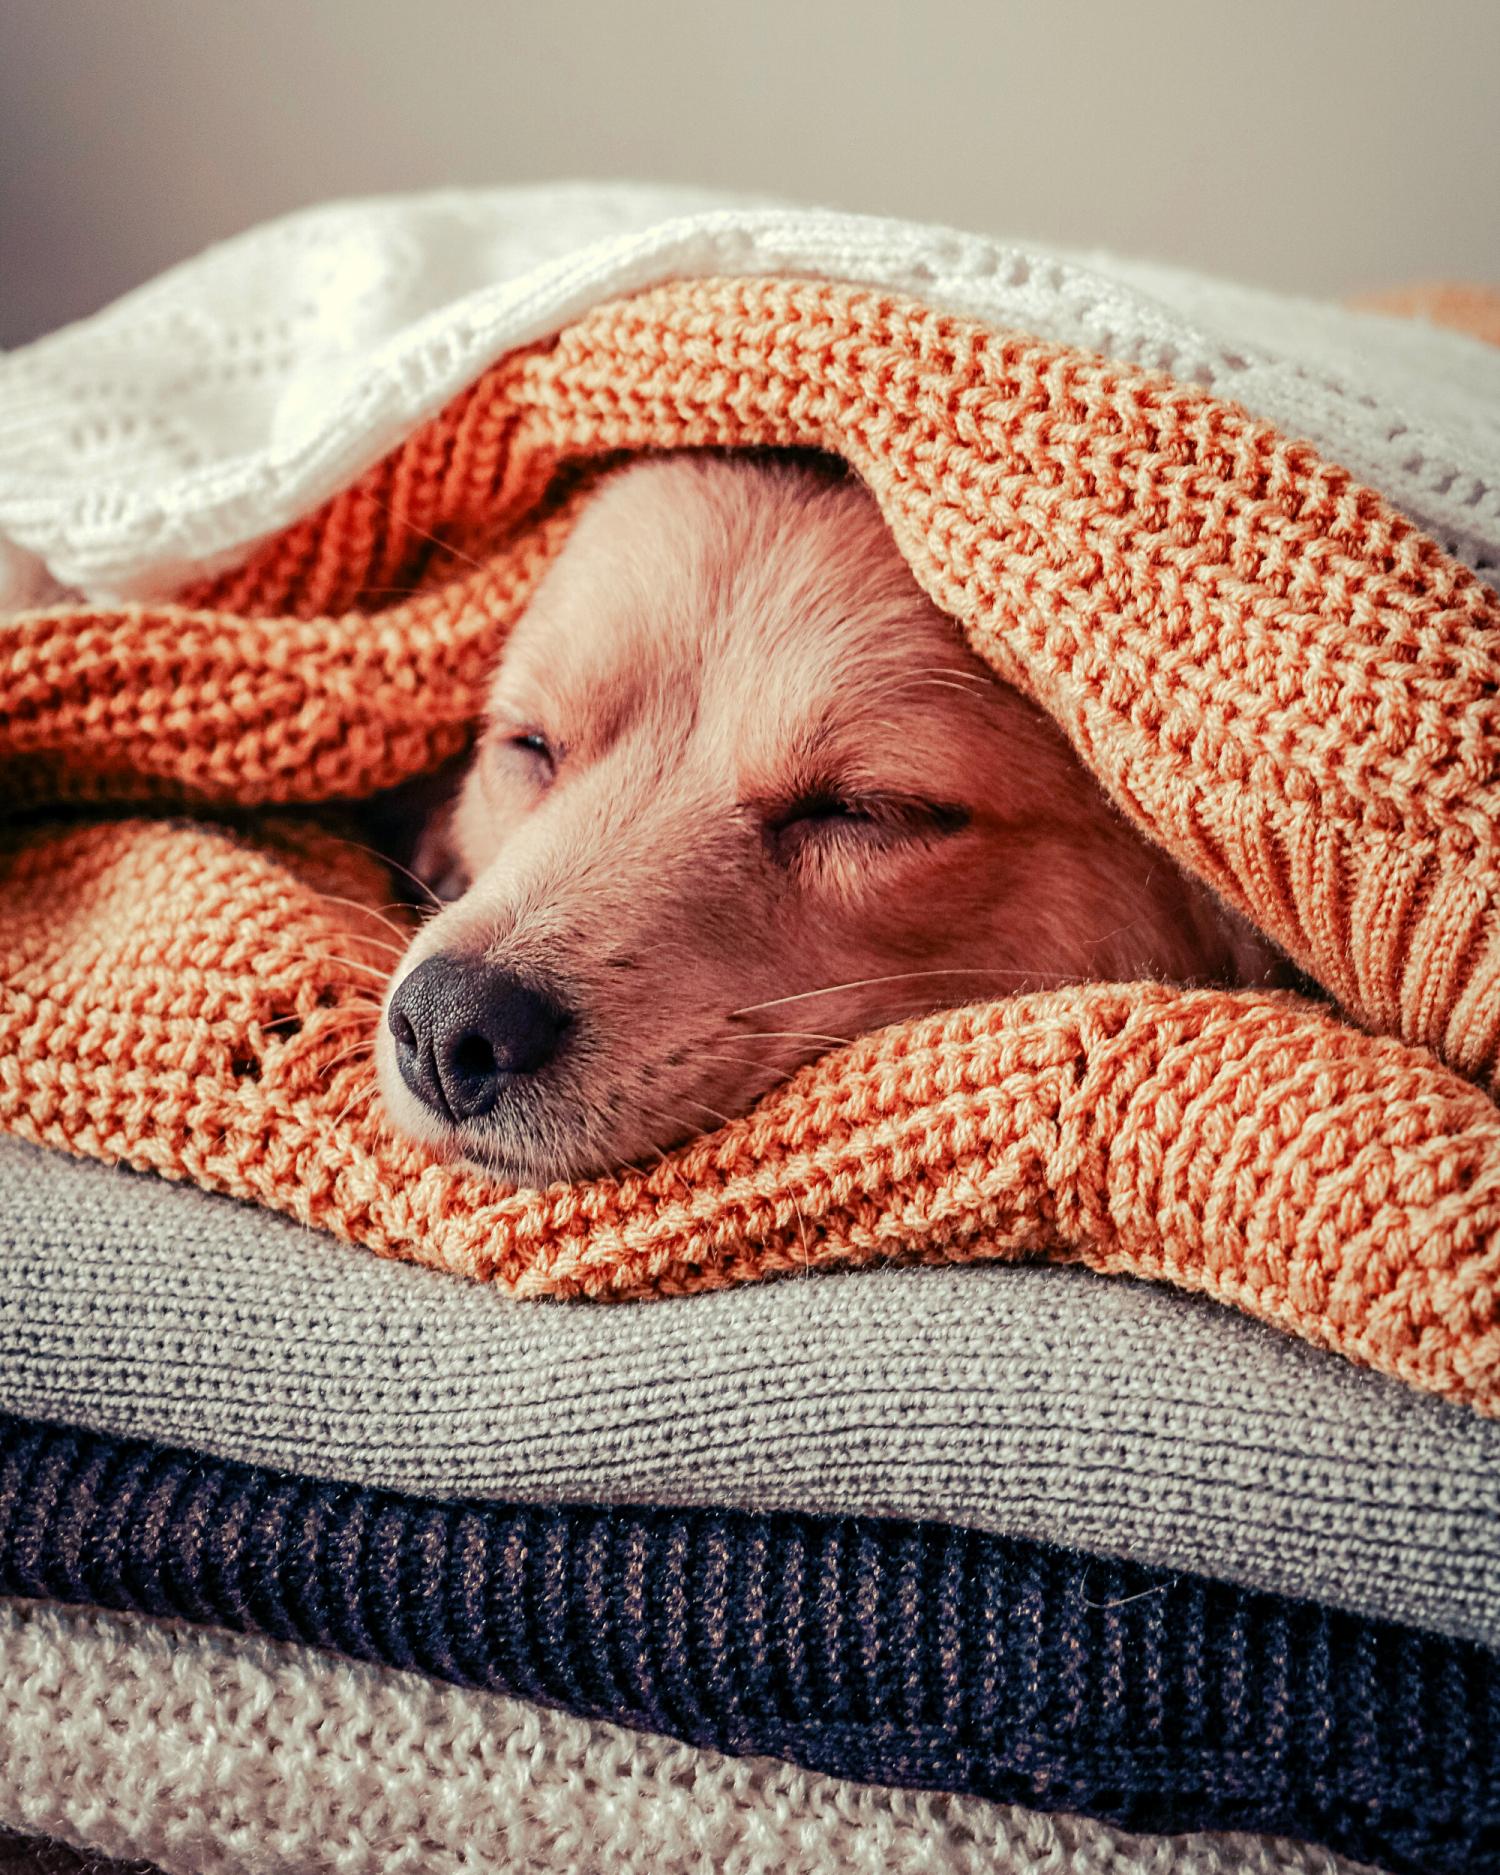 Winter_2021_Dog in blankets